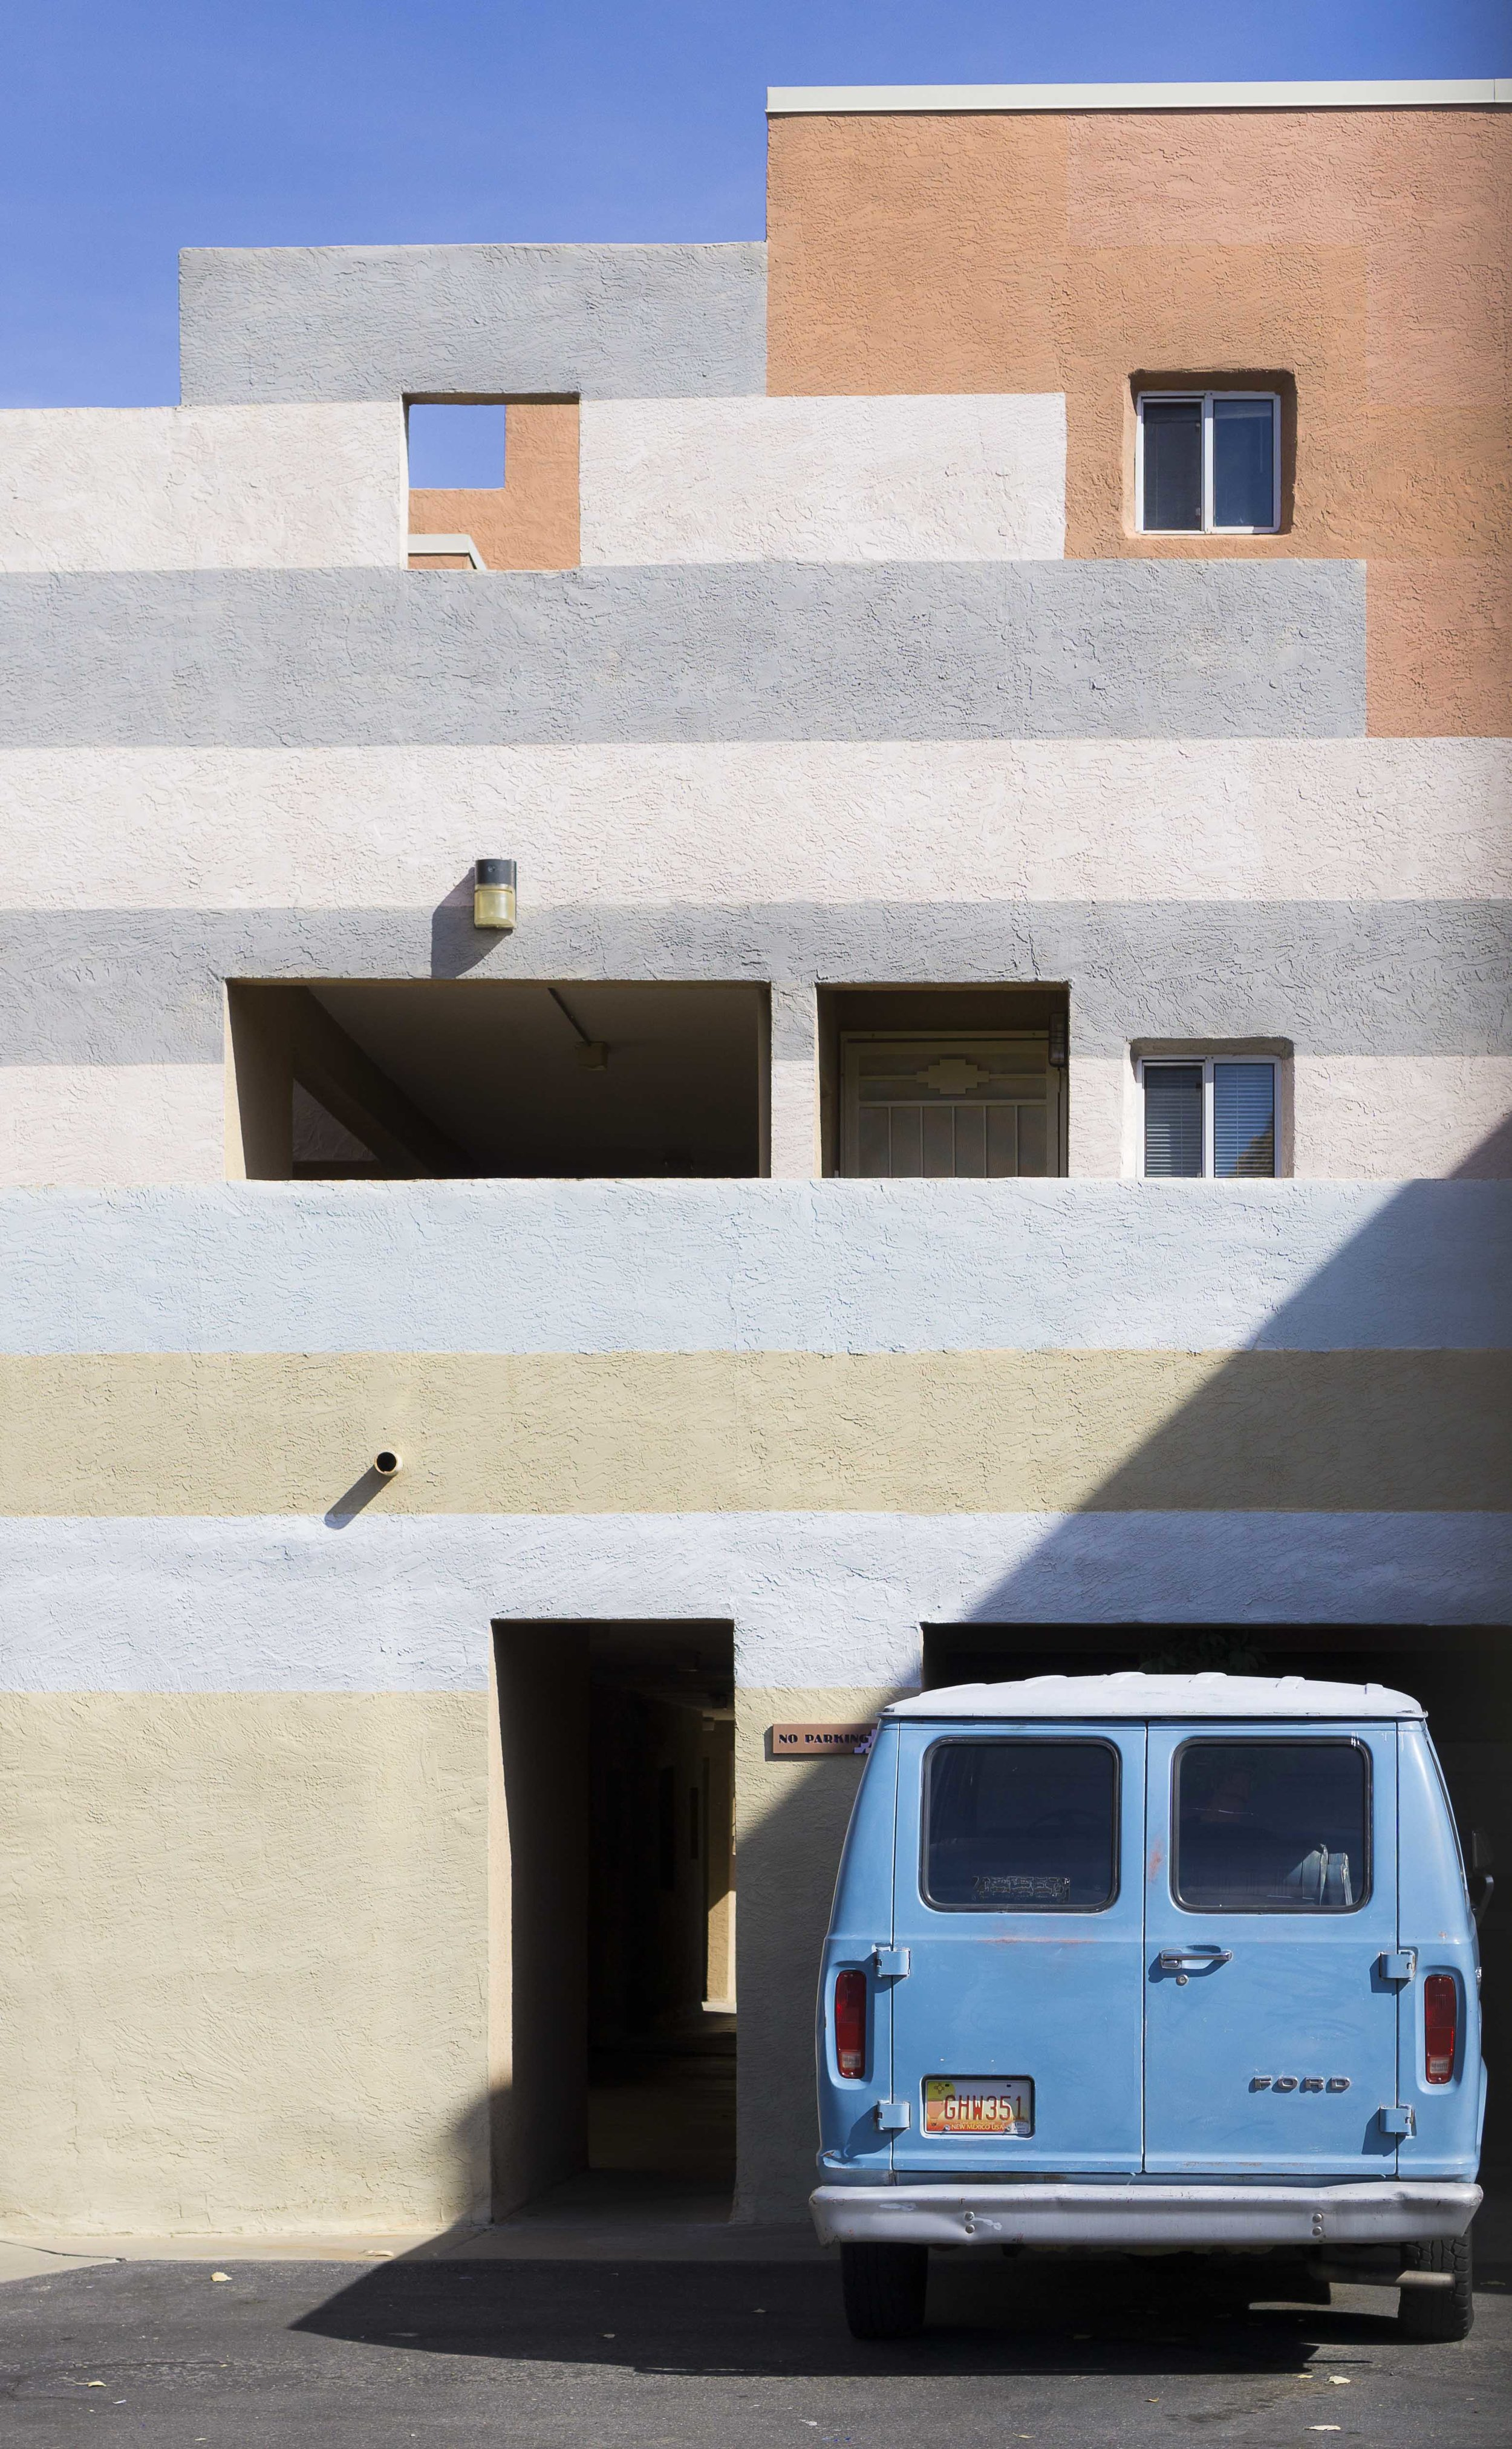 Blue Van photo